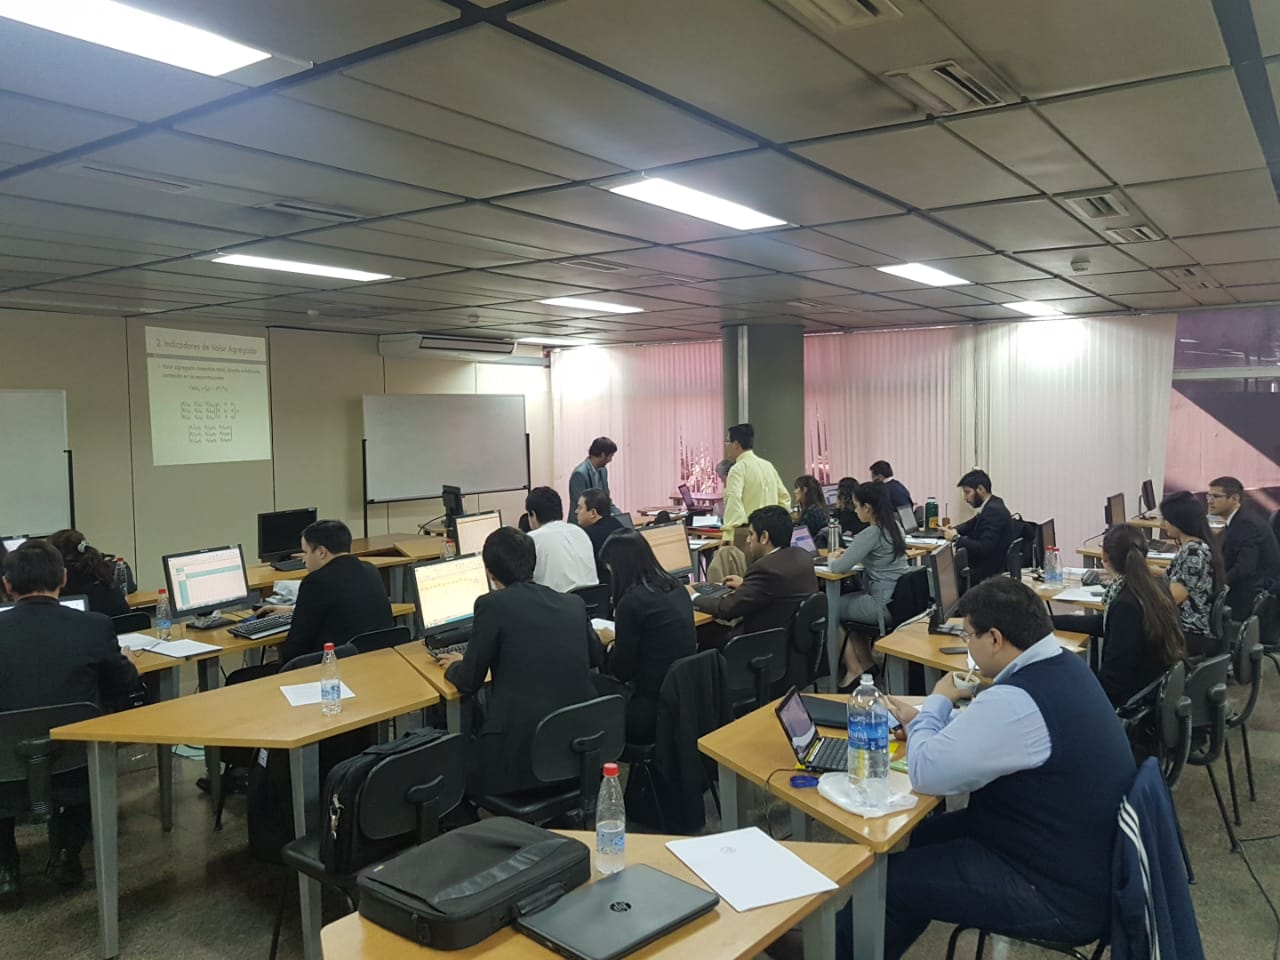 Participantes estudiando